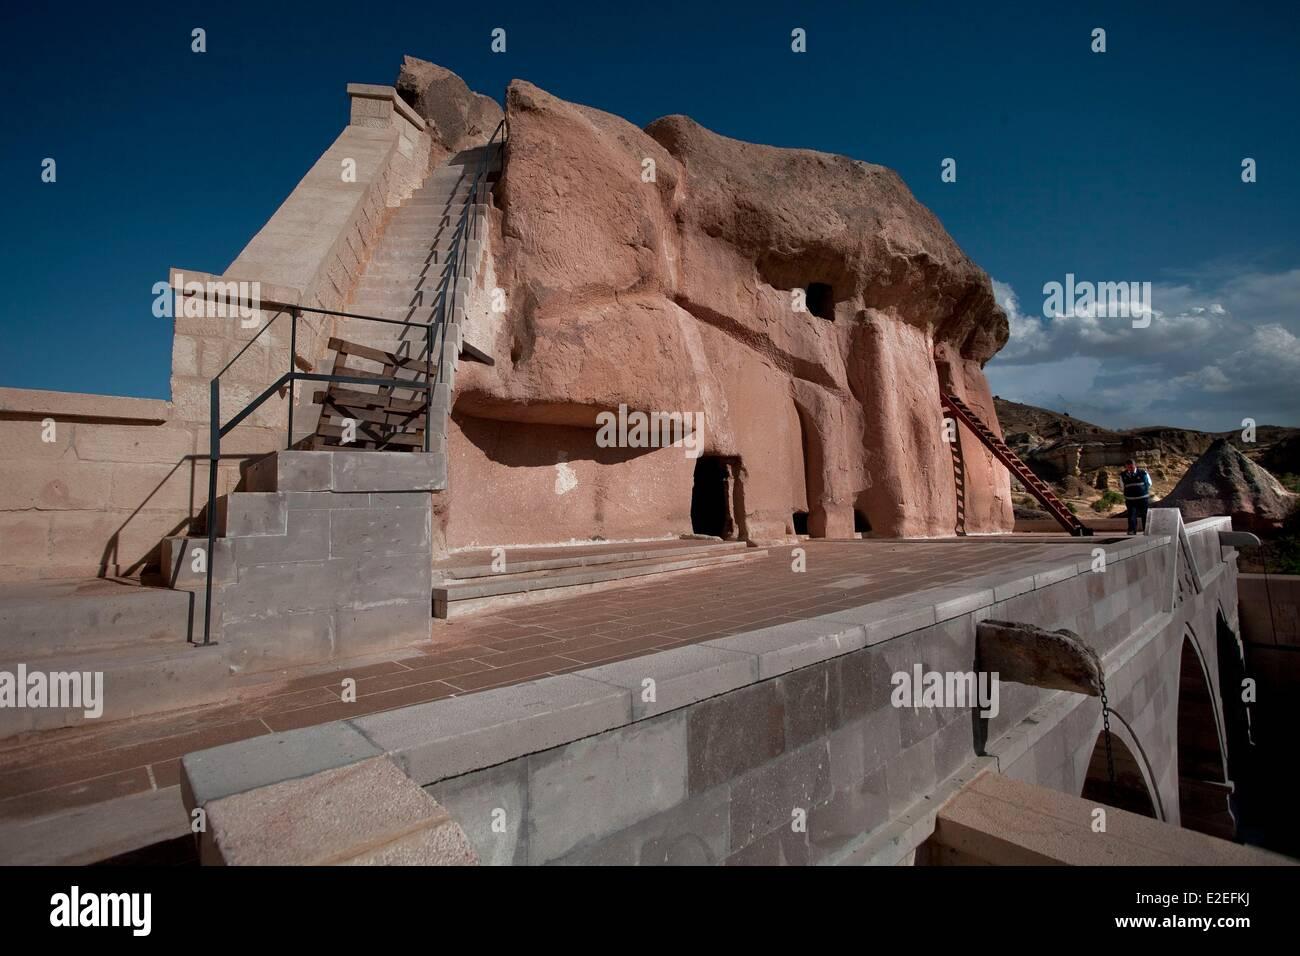 Turkey, Central Anatolia, Capadoccia, Mustafapasa, Saint Nikolaos, listed as World Heritage by the UNESCO - Stock Image